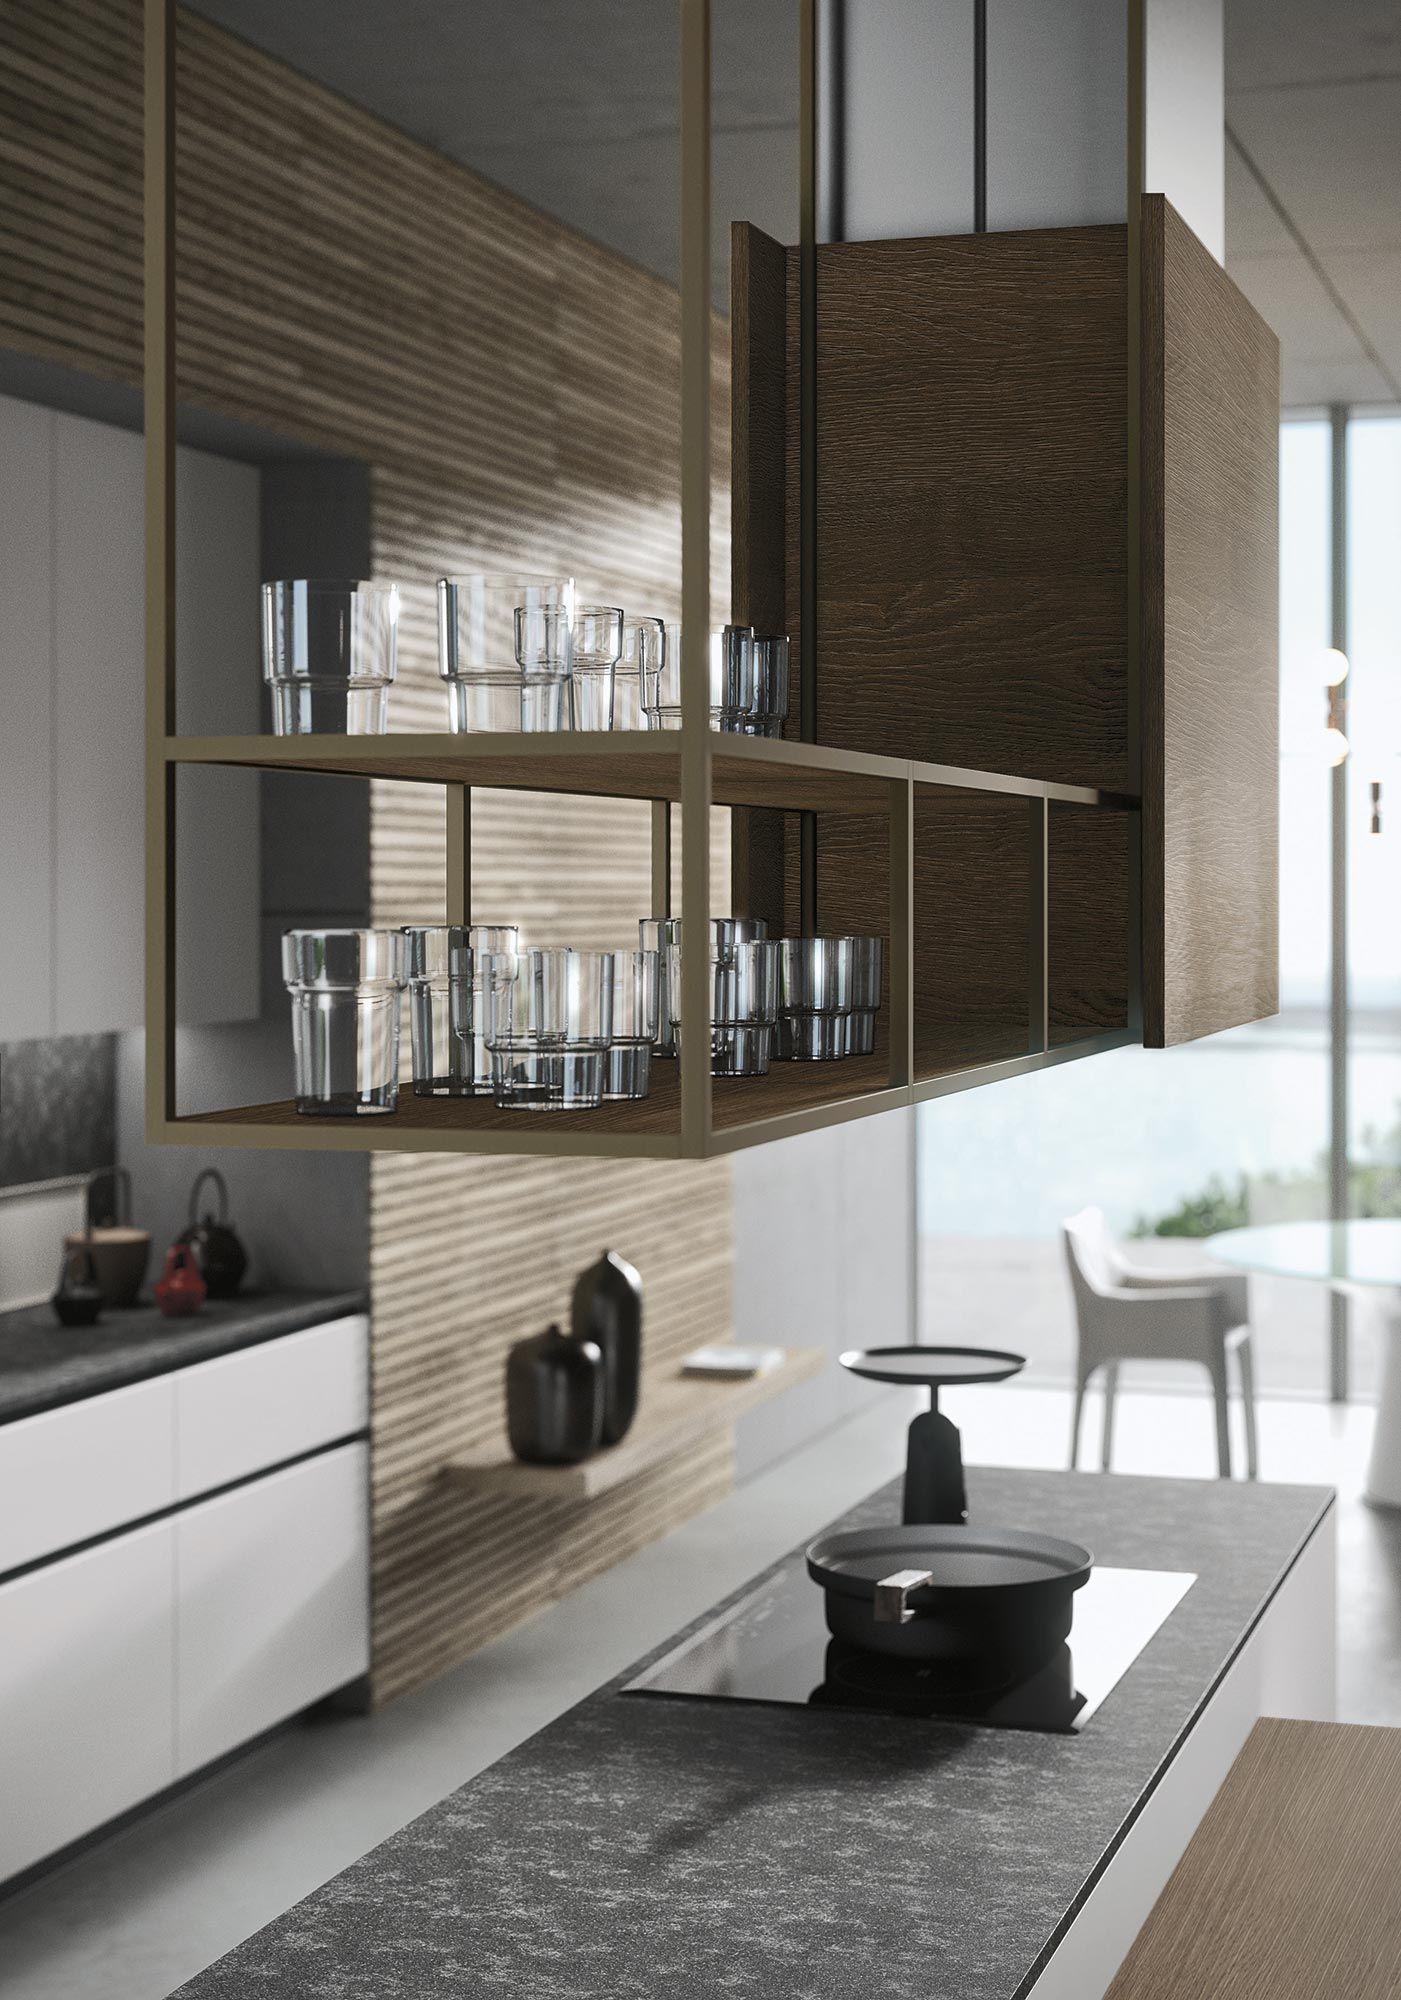 cocina moderna Look | ANALISIS ARQUITECTURA | Pinterest | Cocina ...